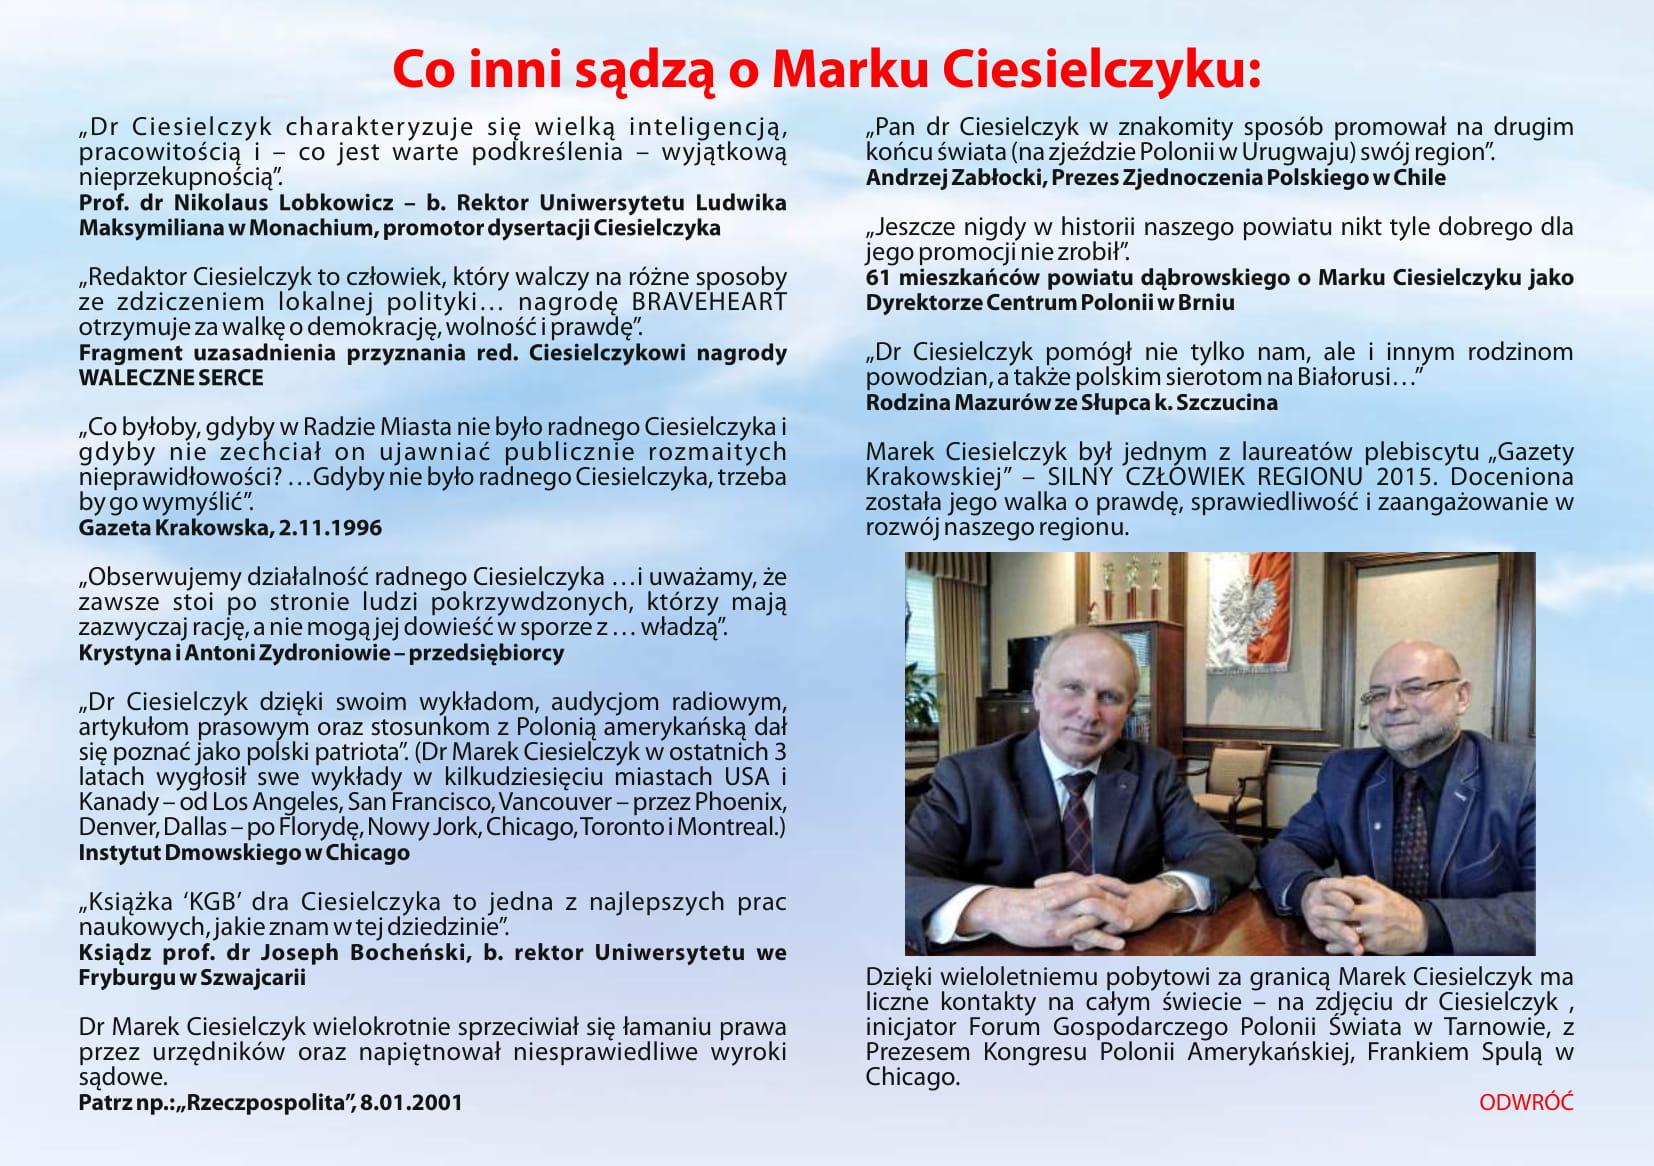 dr Ciesielczyk do PE ulotka jpg 2jpg